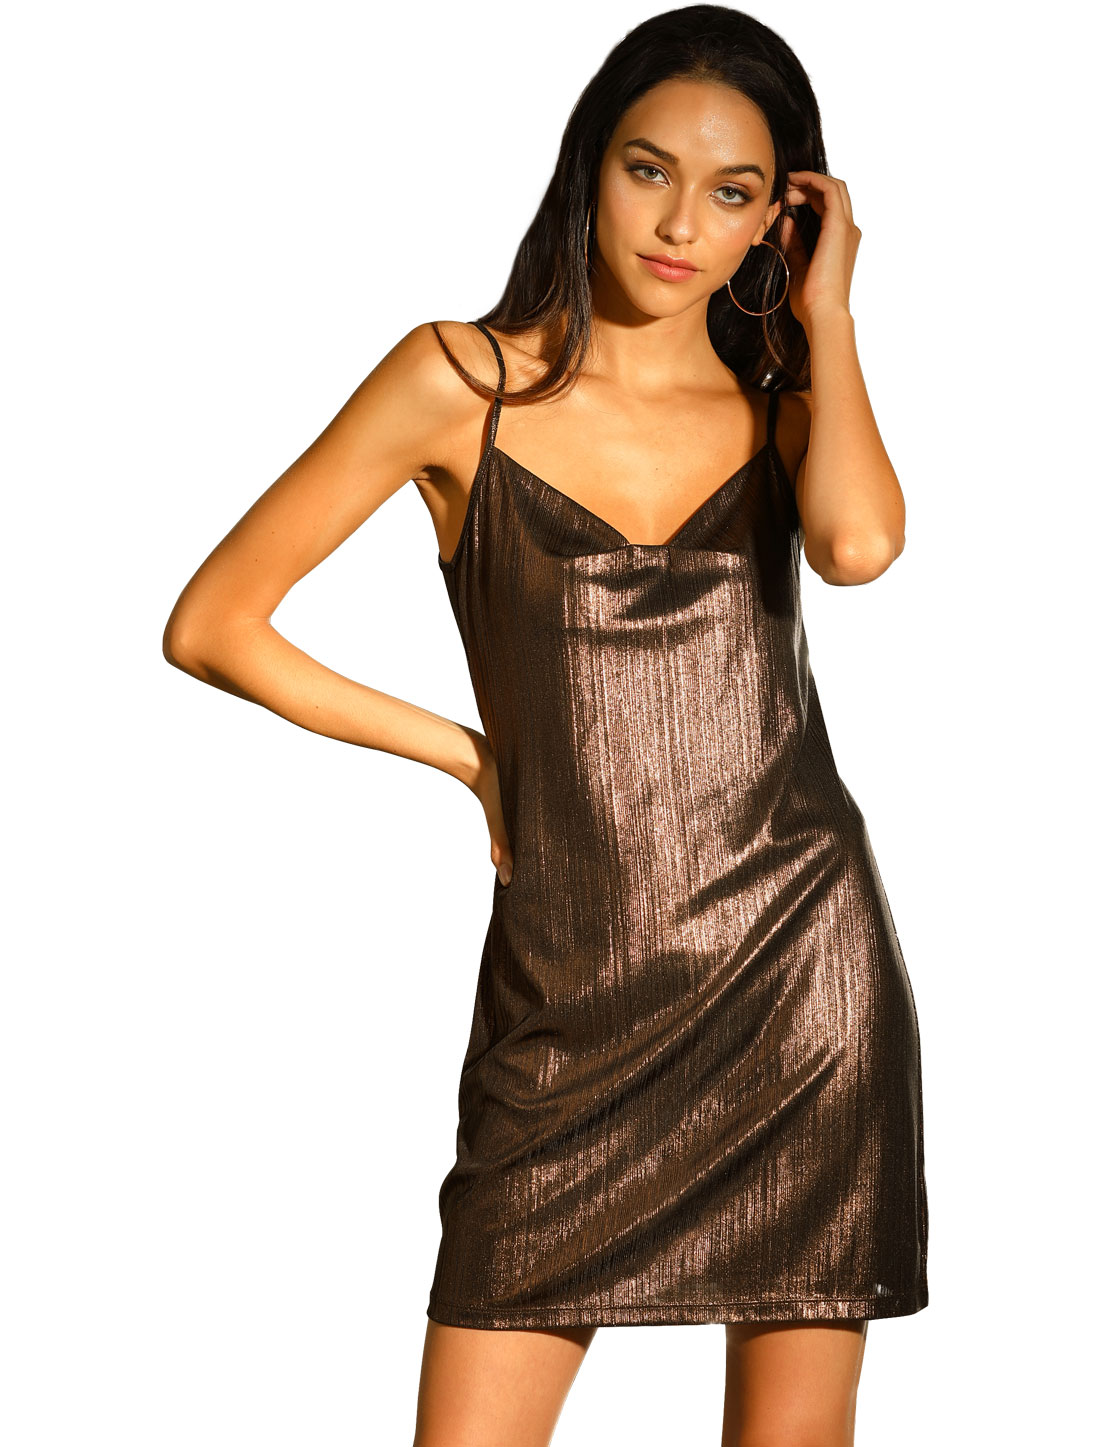 Allegra K Women's Sparkly Glitter Spaghetti Strap Party Dress Coffee Brown XL